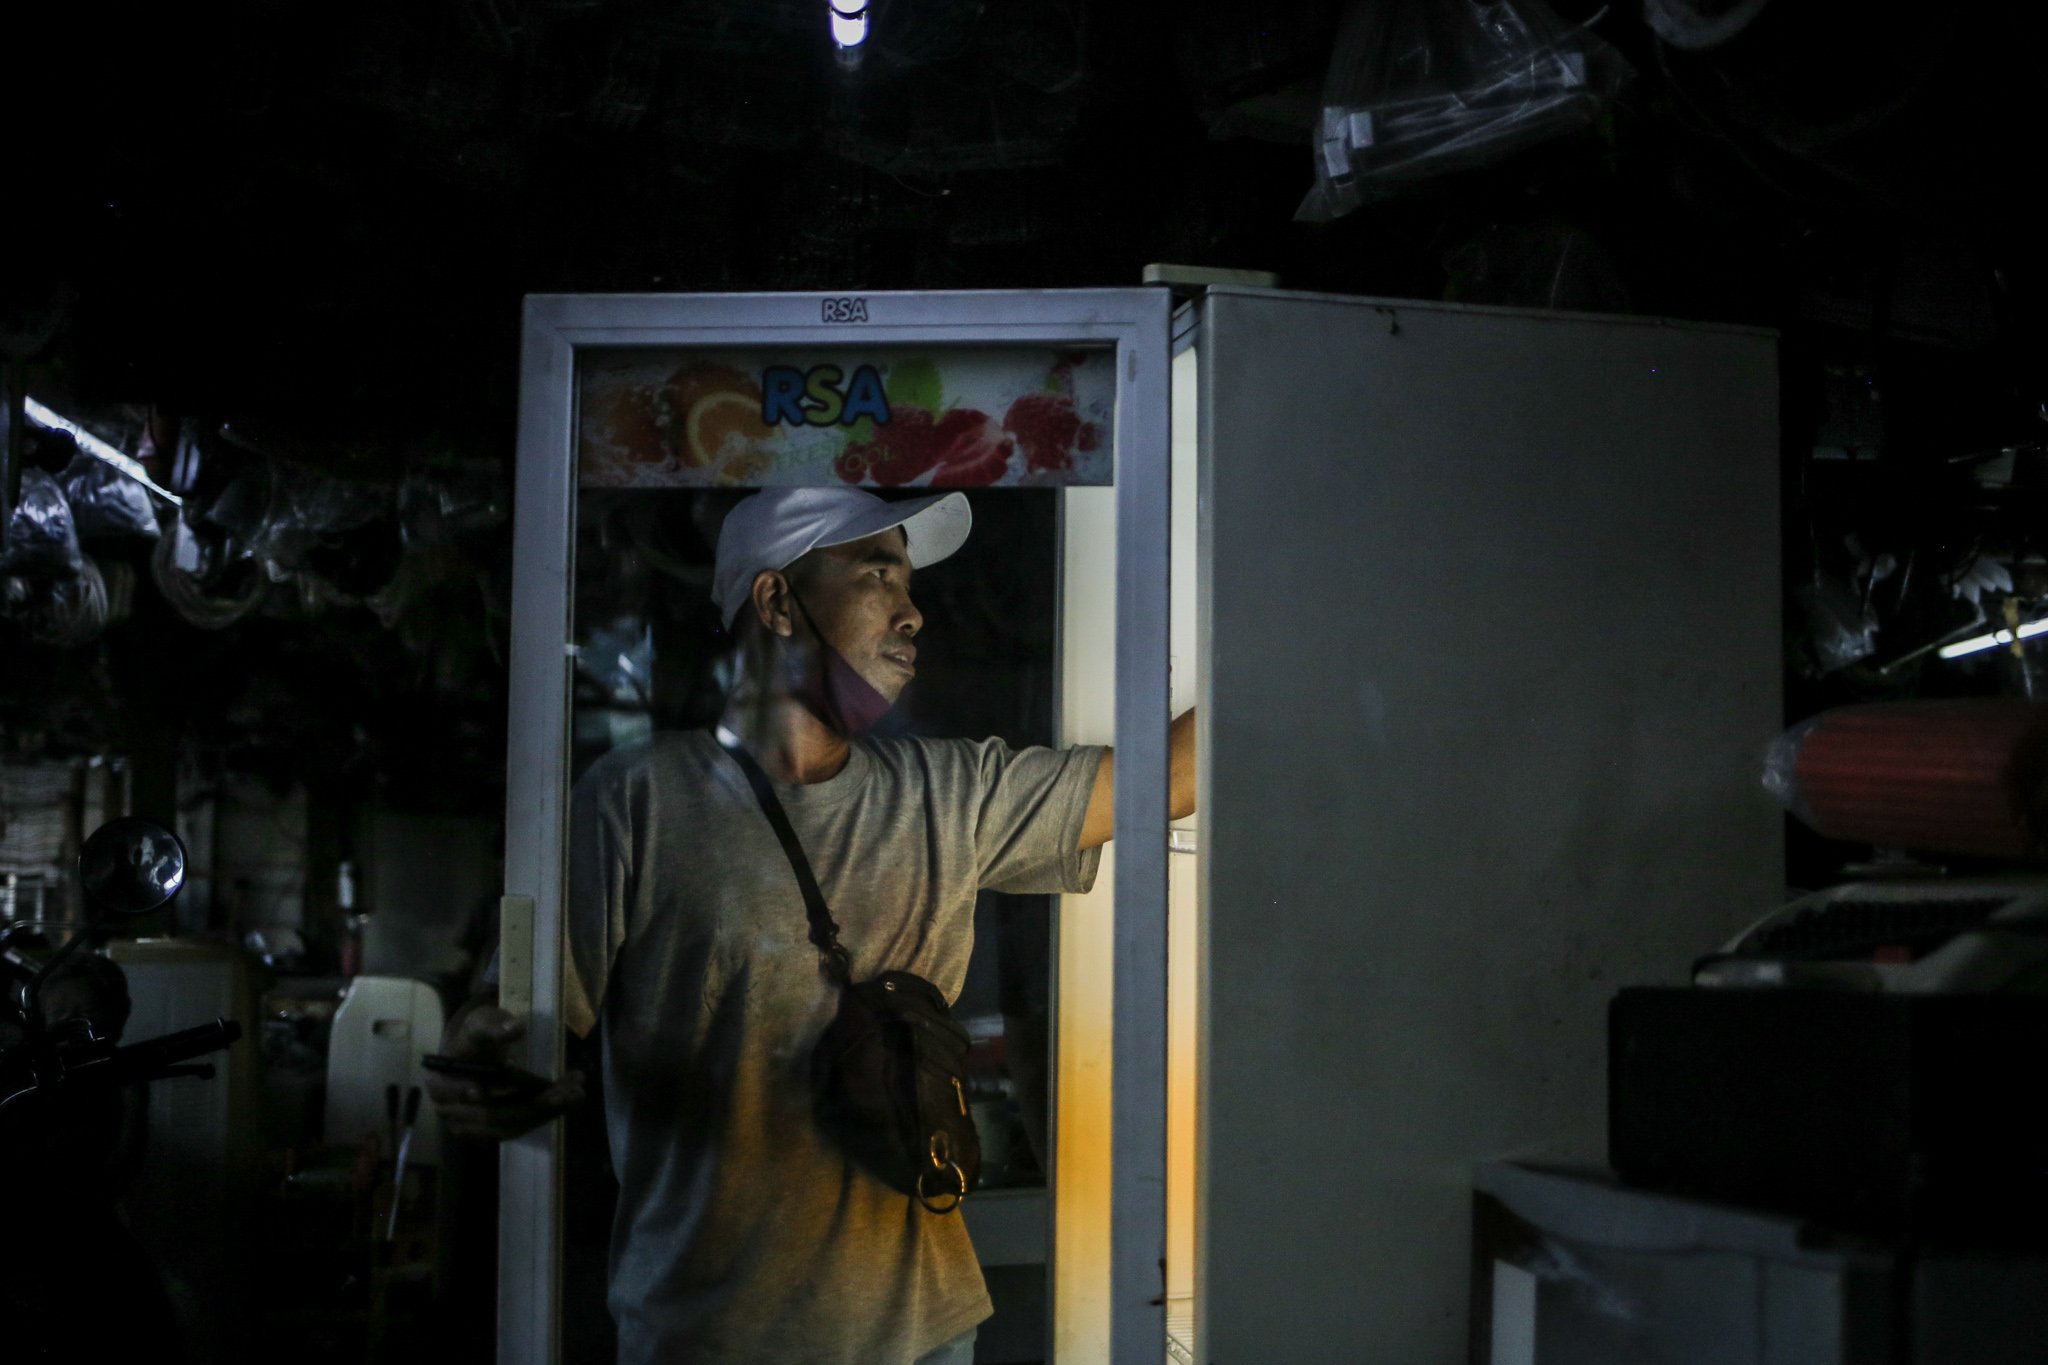 Pengunjung memeriksa kondisi kulkas bekas saat berbelanja di Mal Rongsok, Beji, Depok, Jawa Barat, jumat, (17/9/2021). Terdapat puluhan ribu jenis barang bekas, mulai dari elektronik hingga perabotan dapur dijejerkan di toko loak milik Nurcholis Agi pemilik usaha yang ia mulai dari hobi.